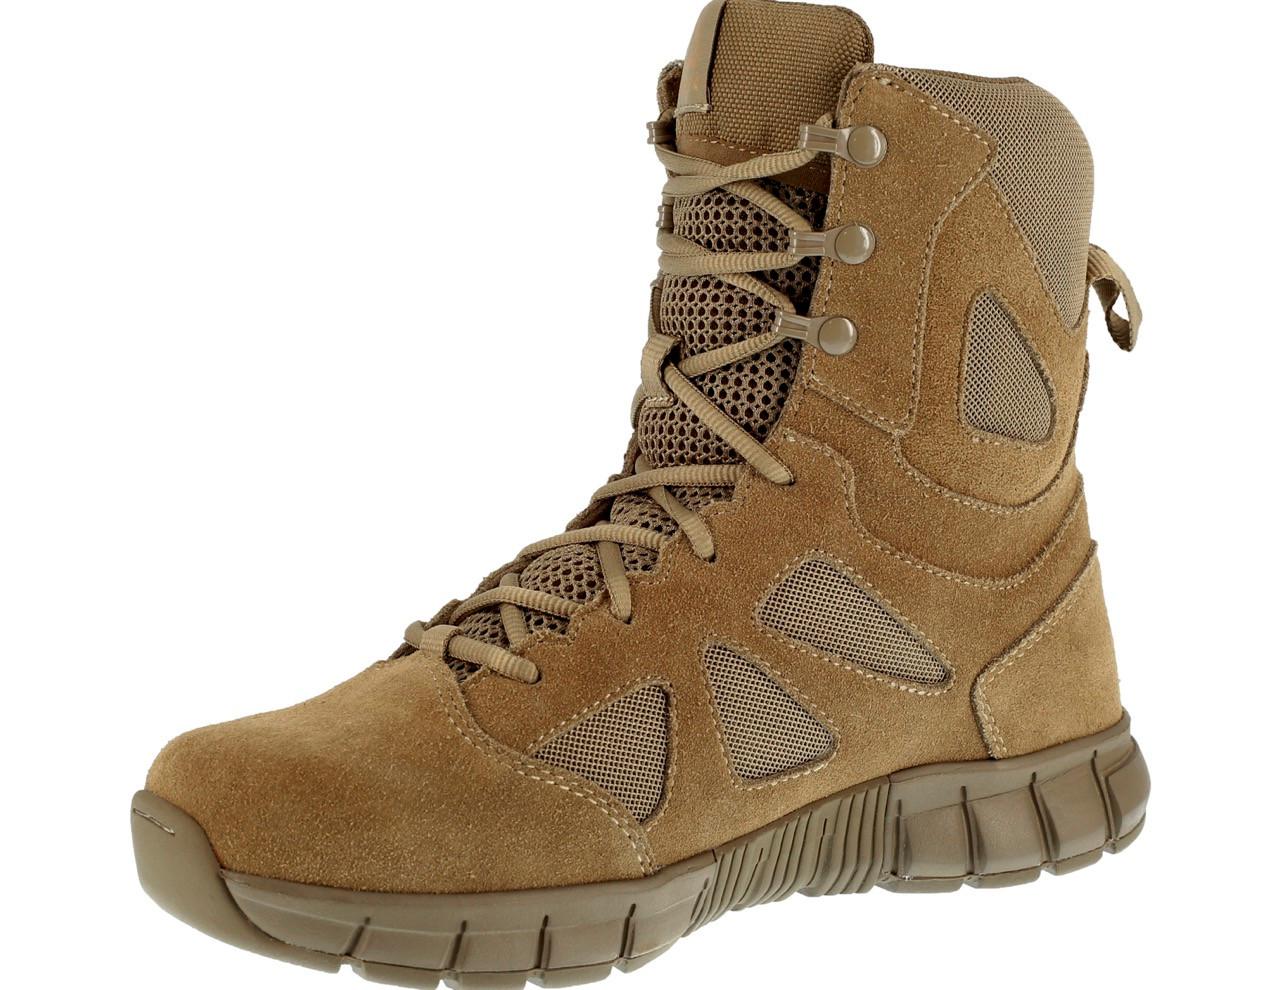 e11b1e6e2030ac Coyote Boots · Reebok RB8808 Men s Sublite Cushion Tactical 8